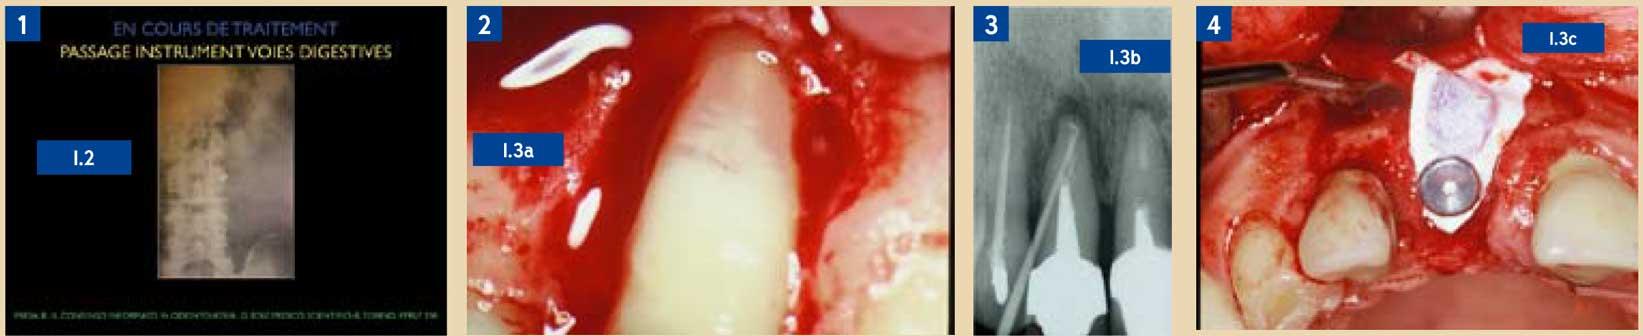 L'urgence-en-endodontie